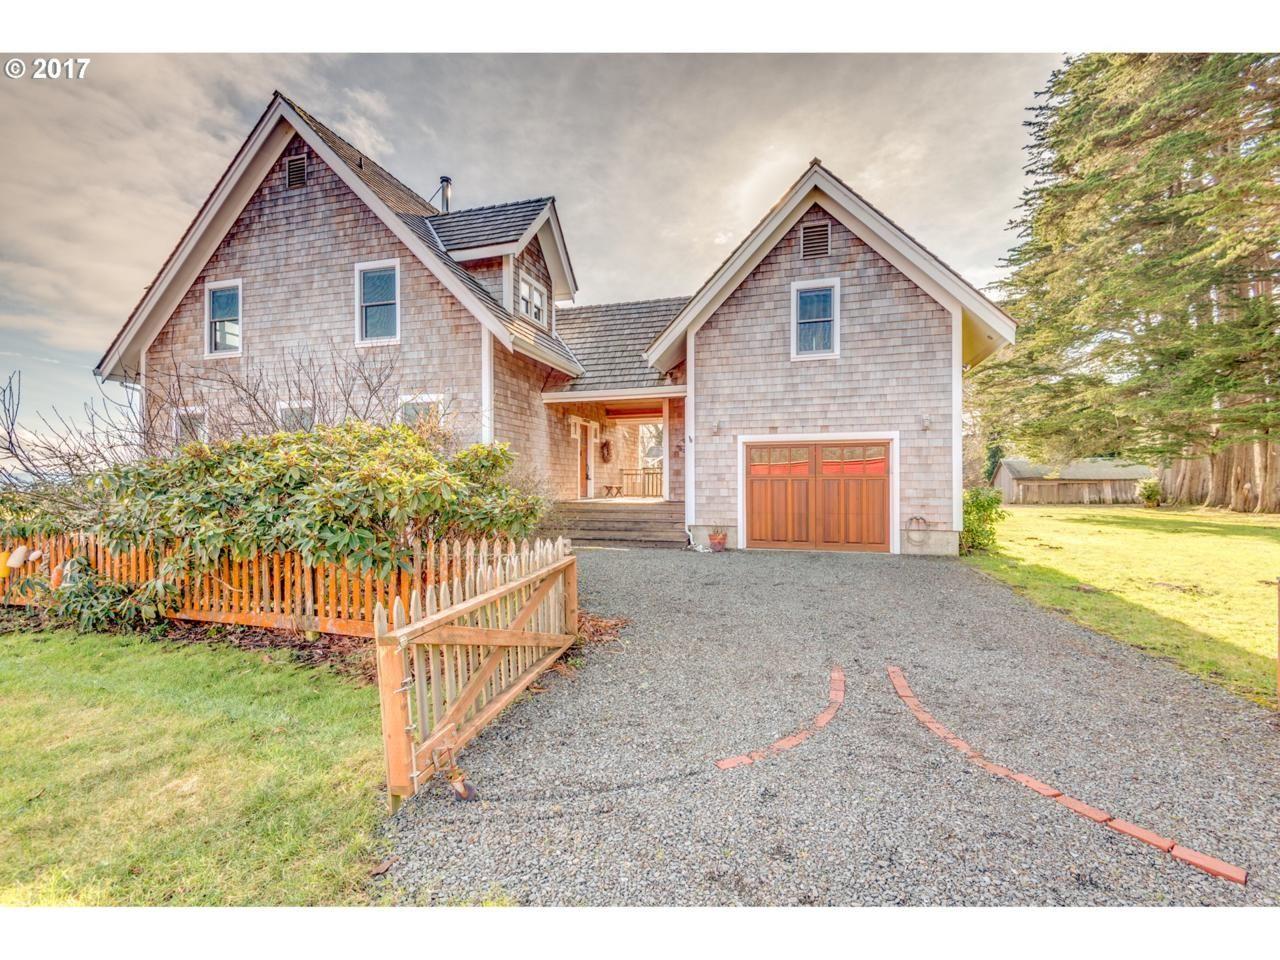 Best Cedar Shake Exterior With Images Shingle Siding House 400 x 300